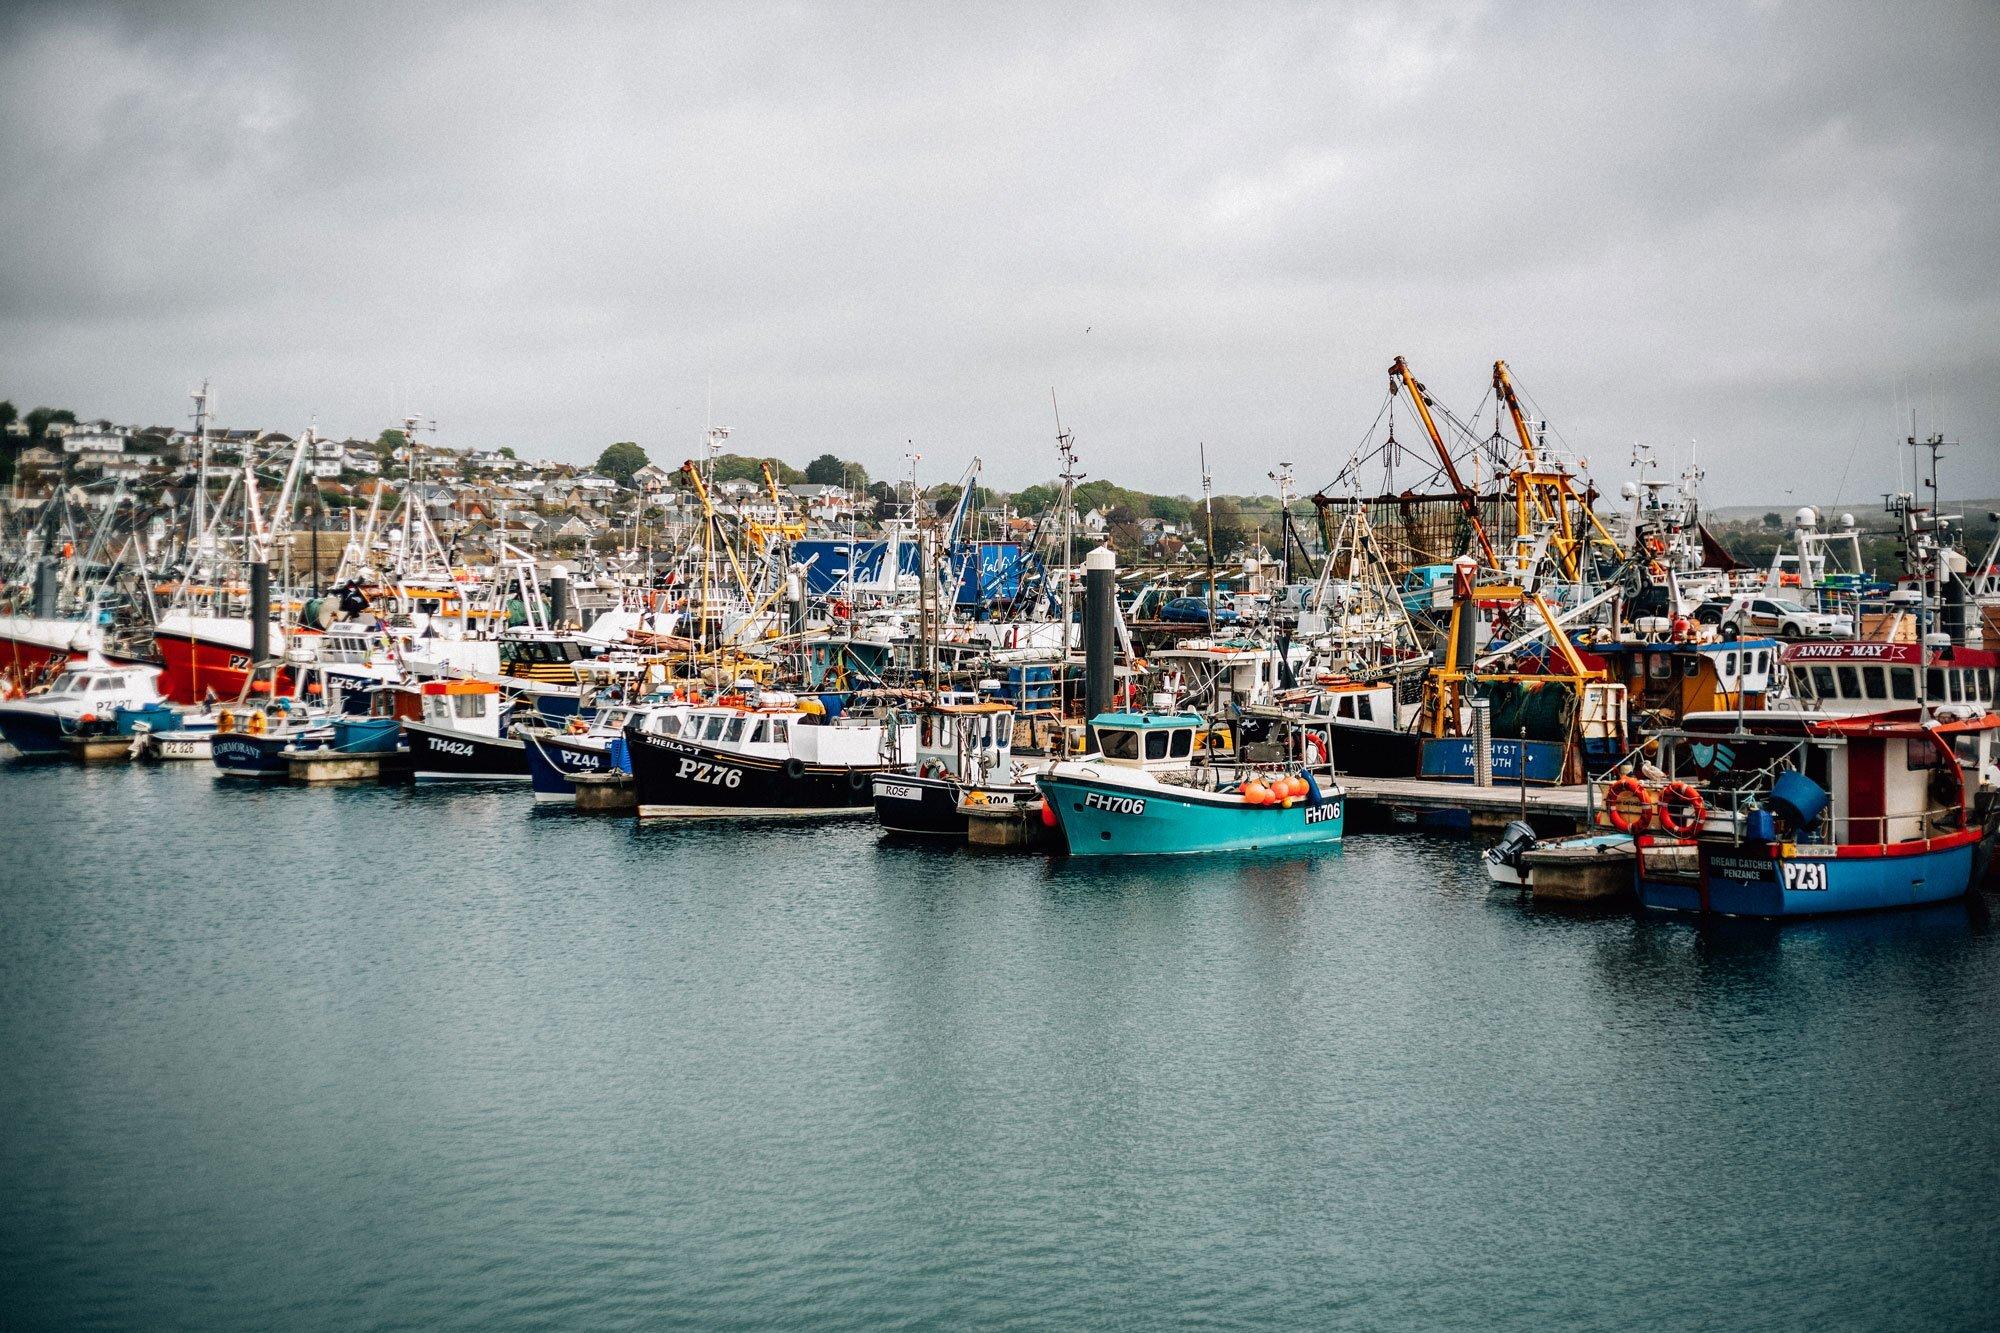 Pete-Geall-Boats-Bobbing-in-Newlyn-Harbour.jpg